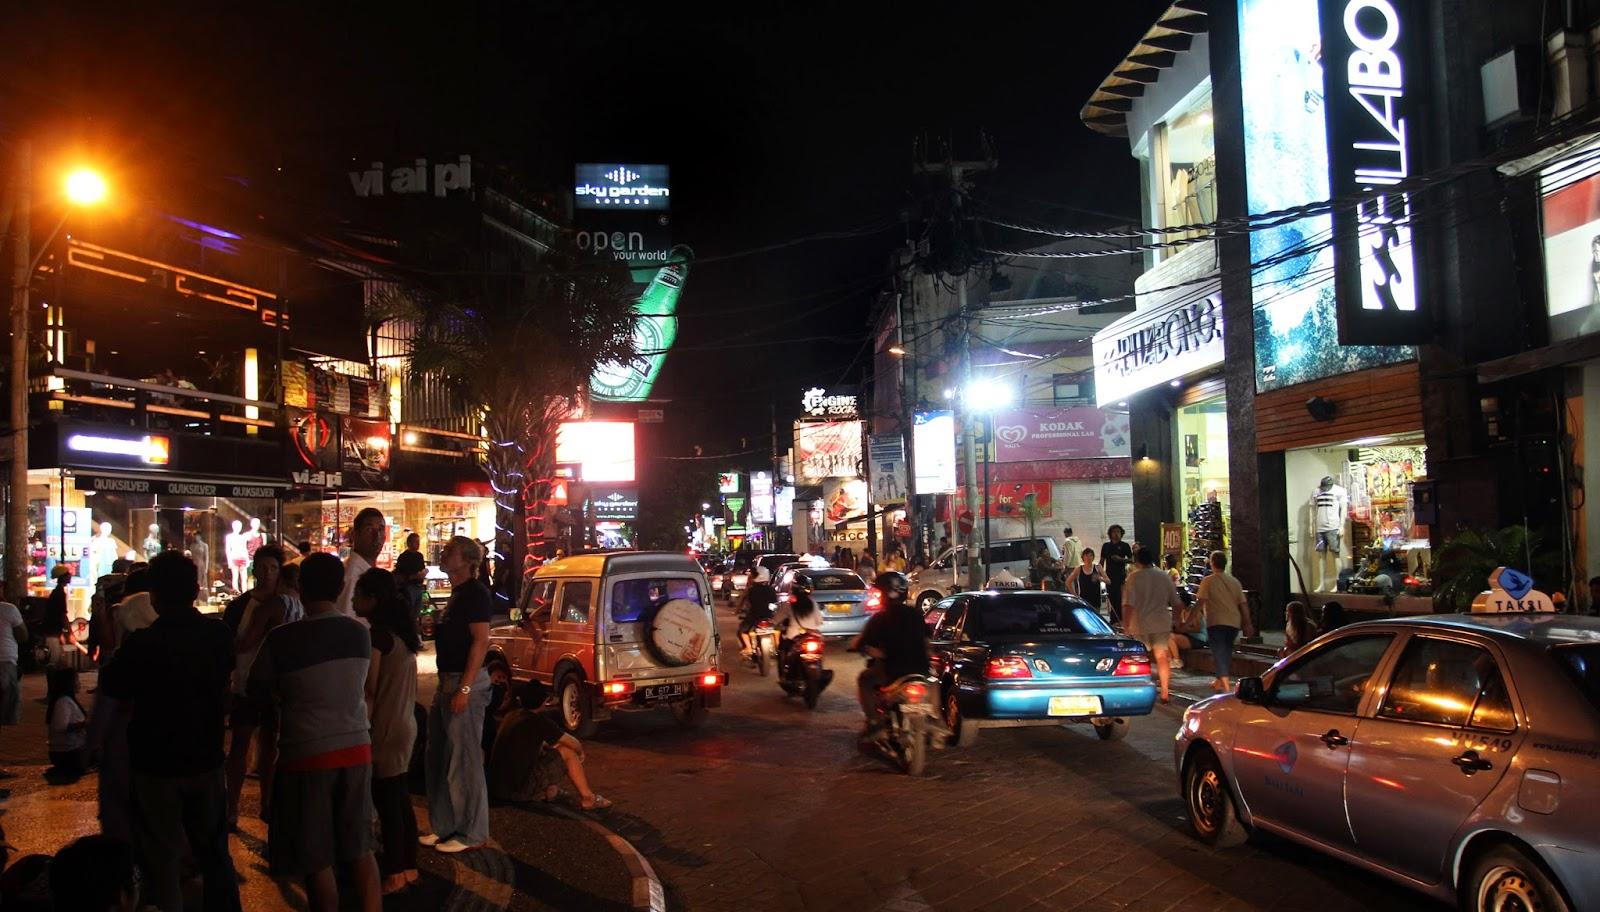 Tempat Nongkrong di Bali untuk Anak Muda